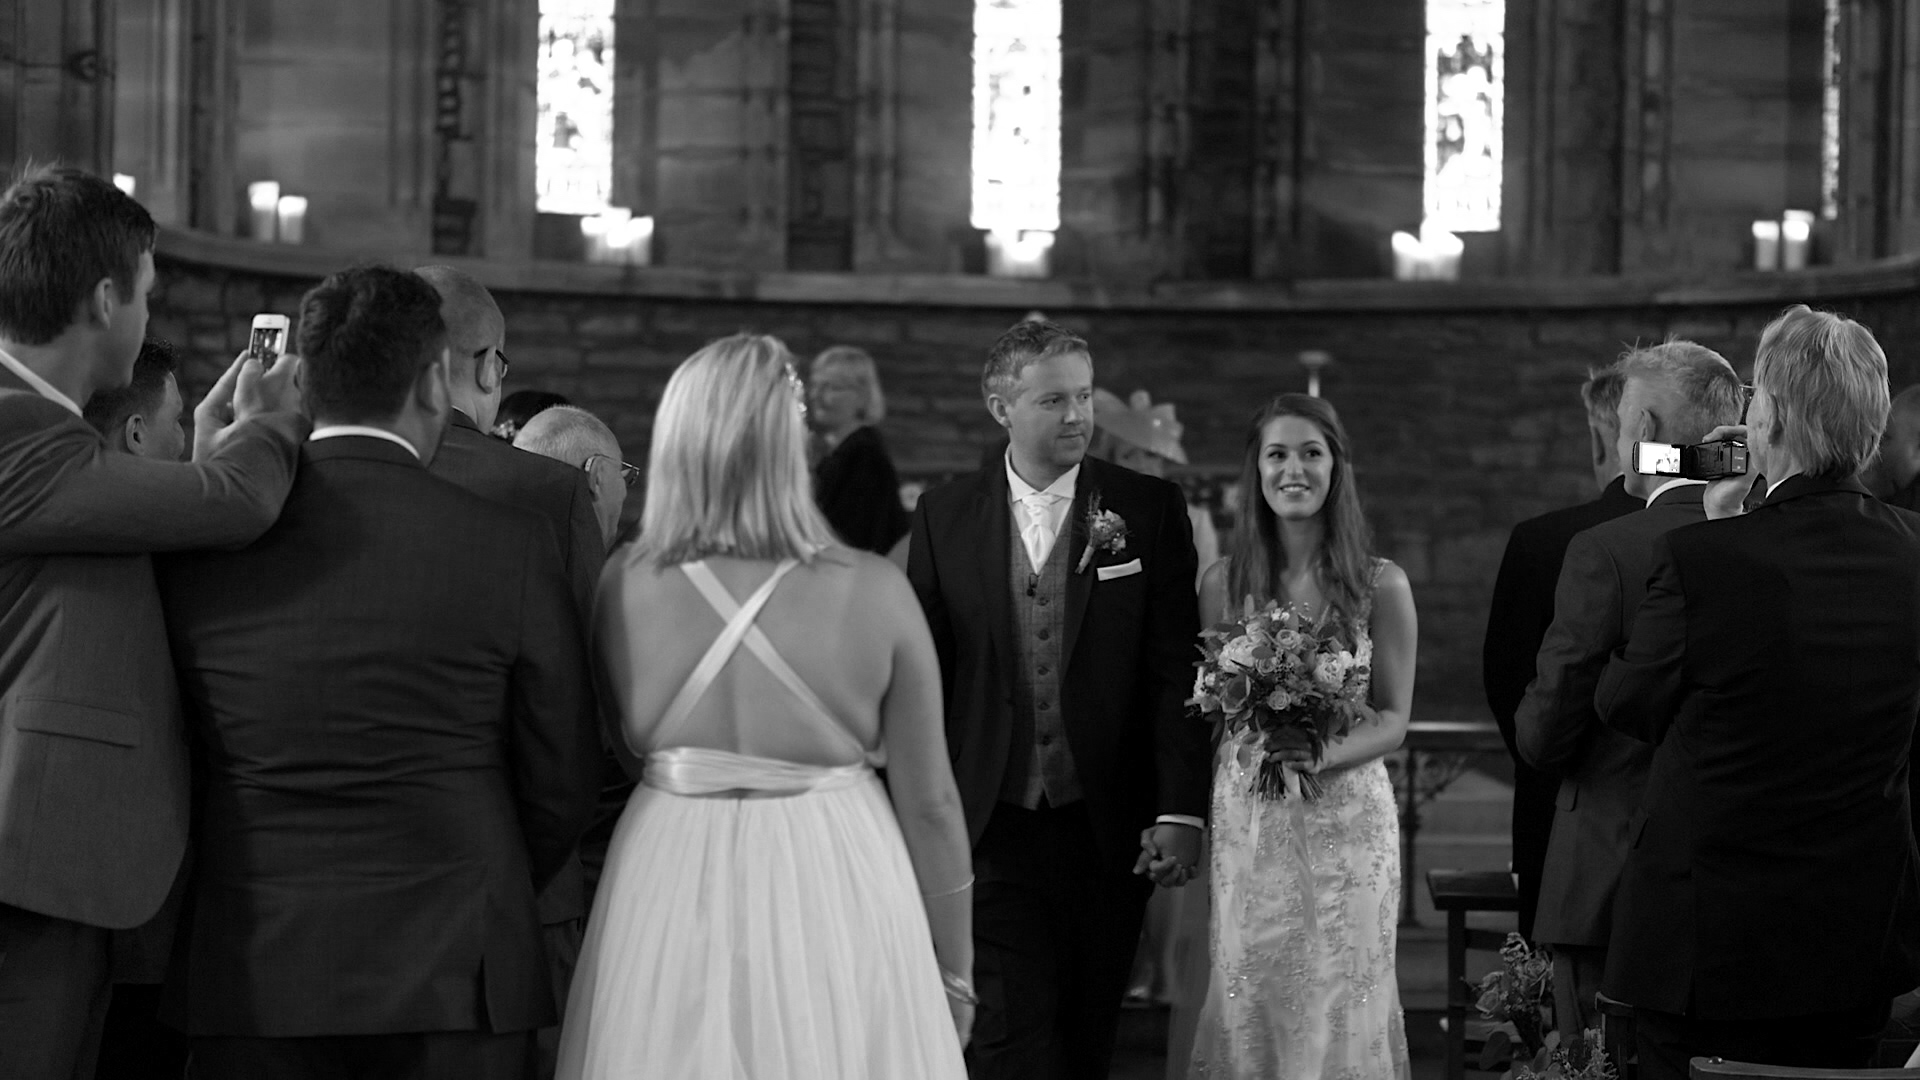 DRUMTOCHTY-SUMMER-WEDDING (12).jpg